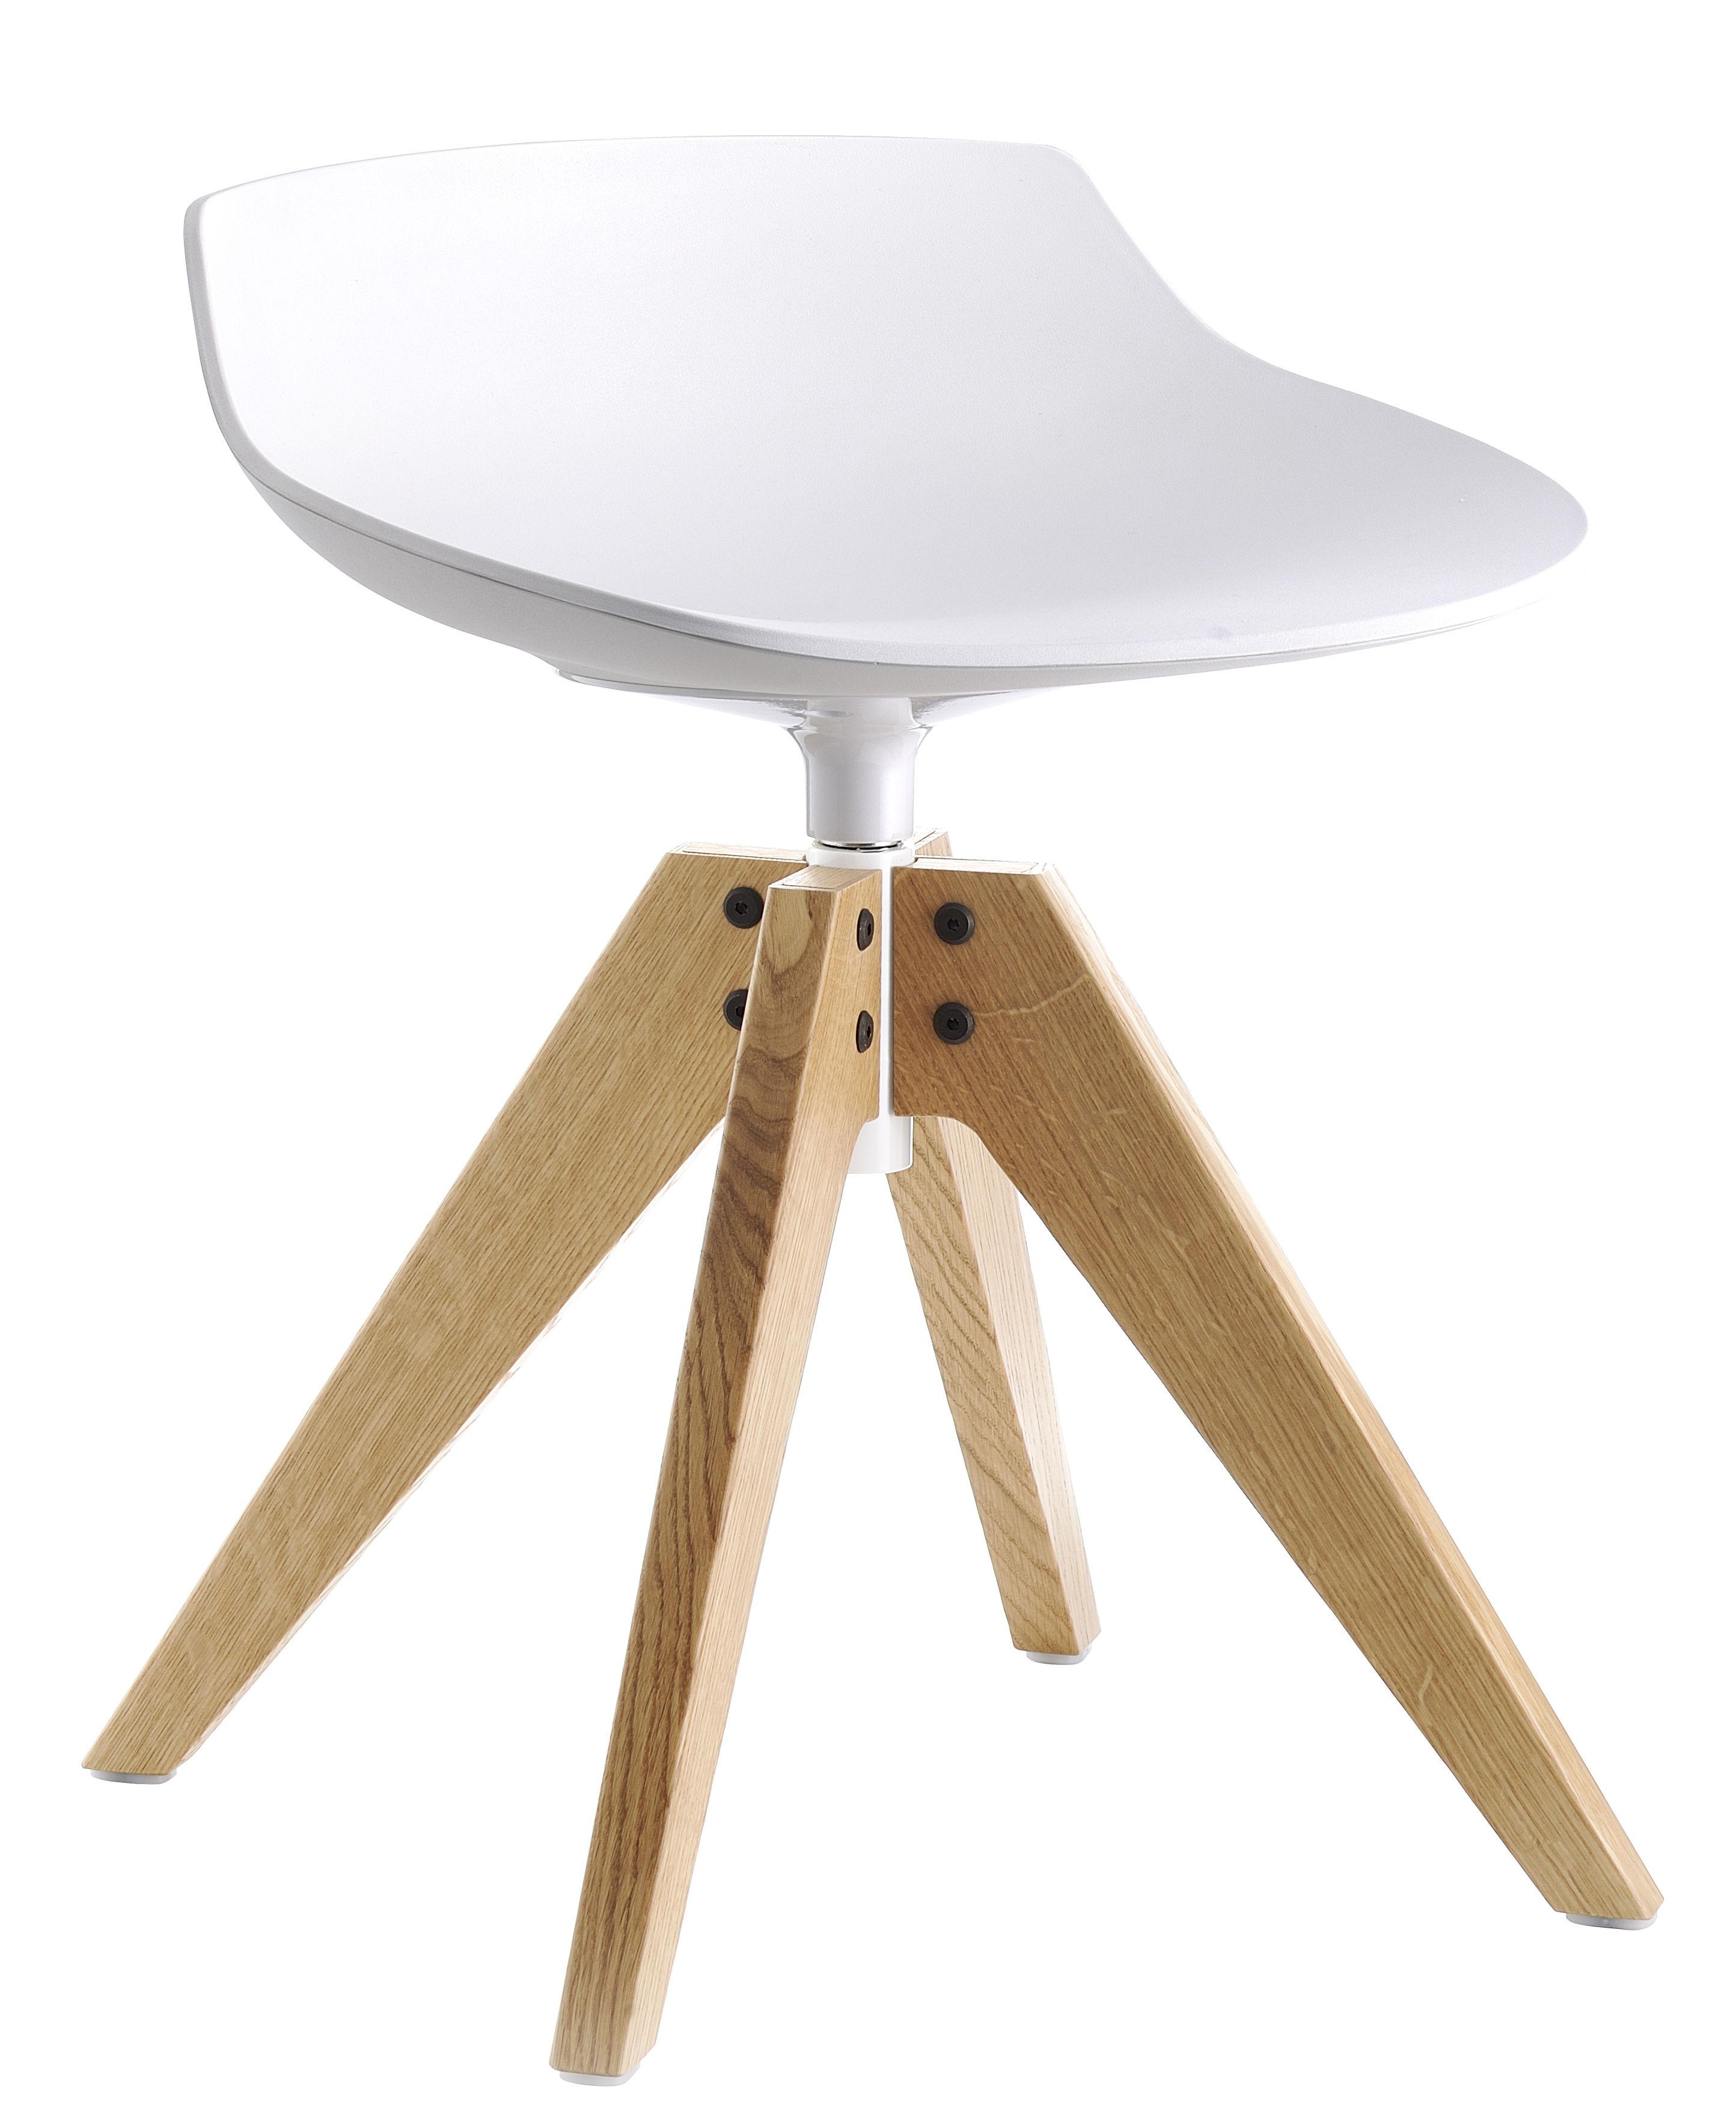 Furniture - Stools - Flow Stool by MDF Italia - White / Natural oak legs - Polyurethane, Solid oak